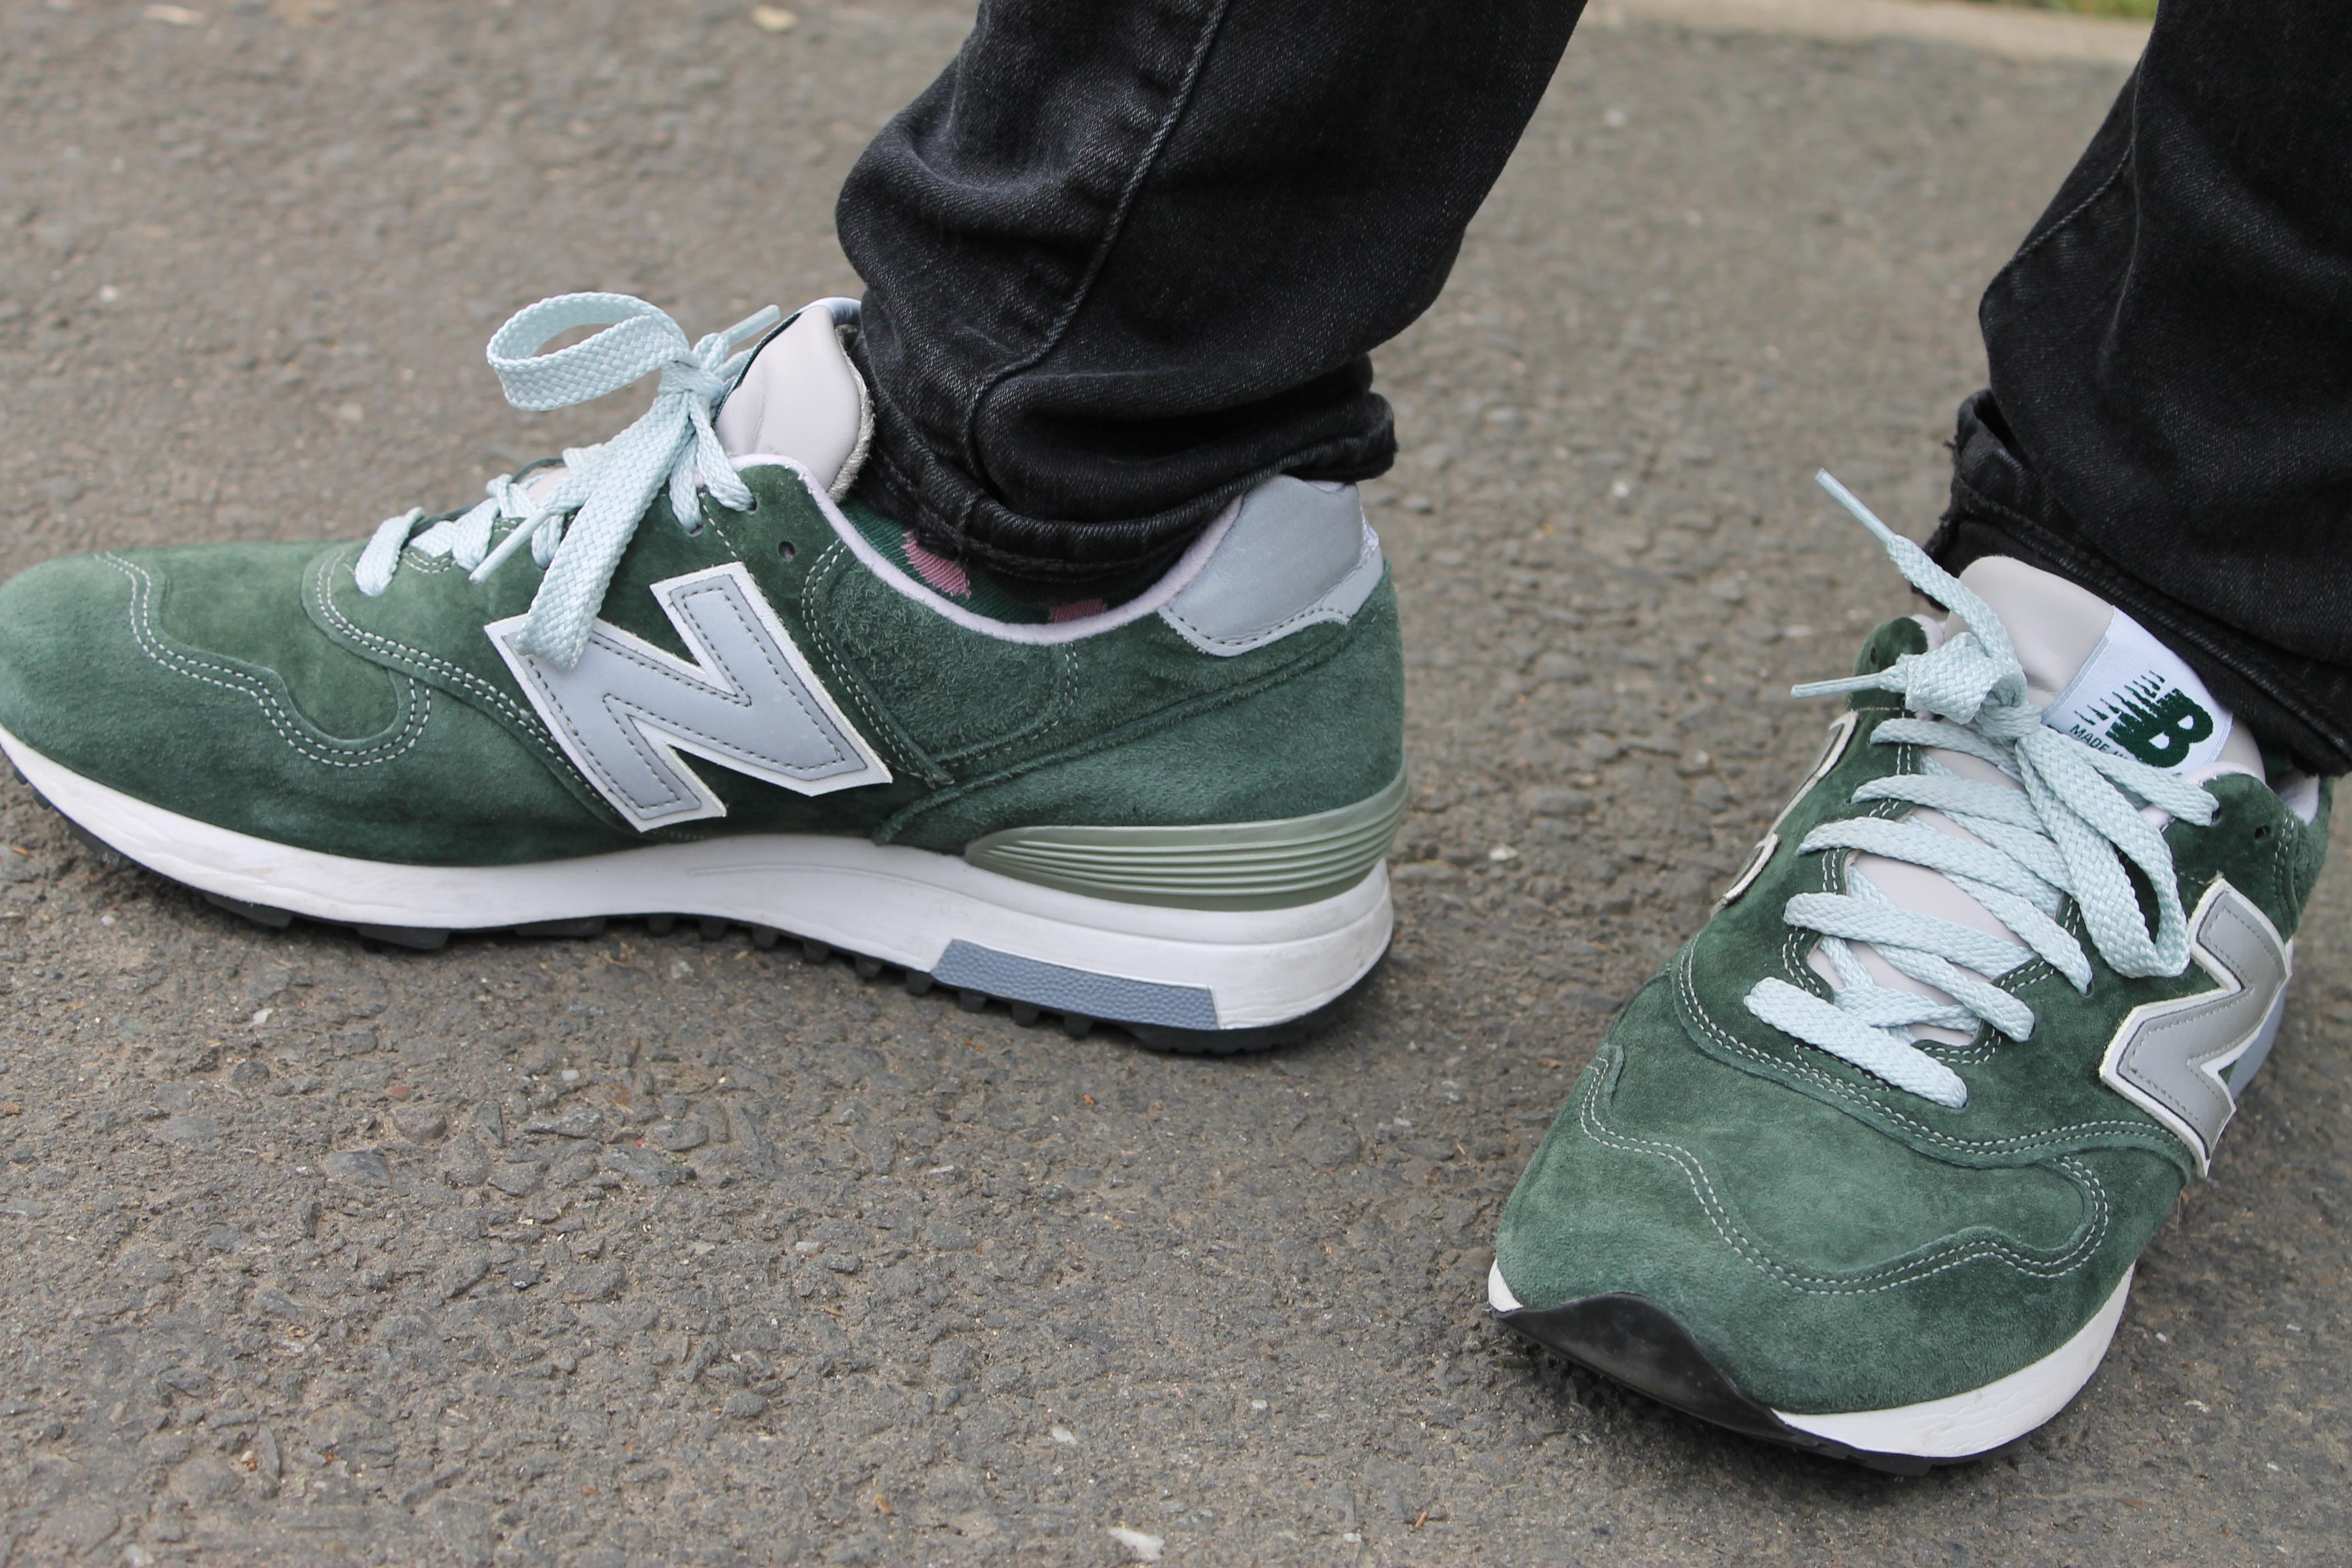 grandpa shoes sneakers